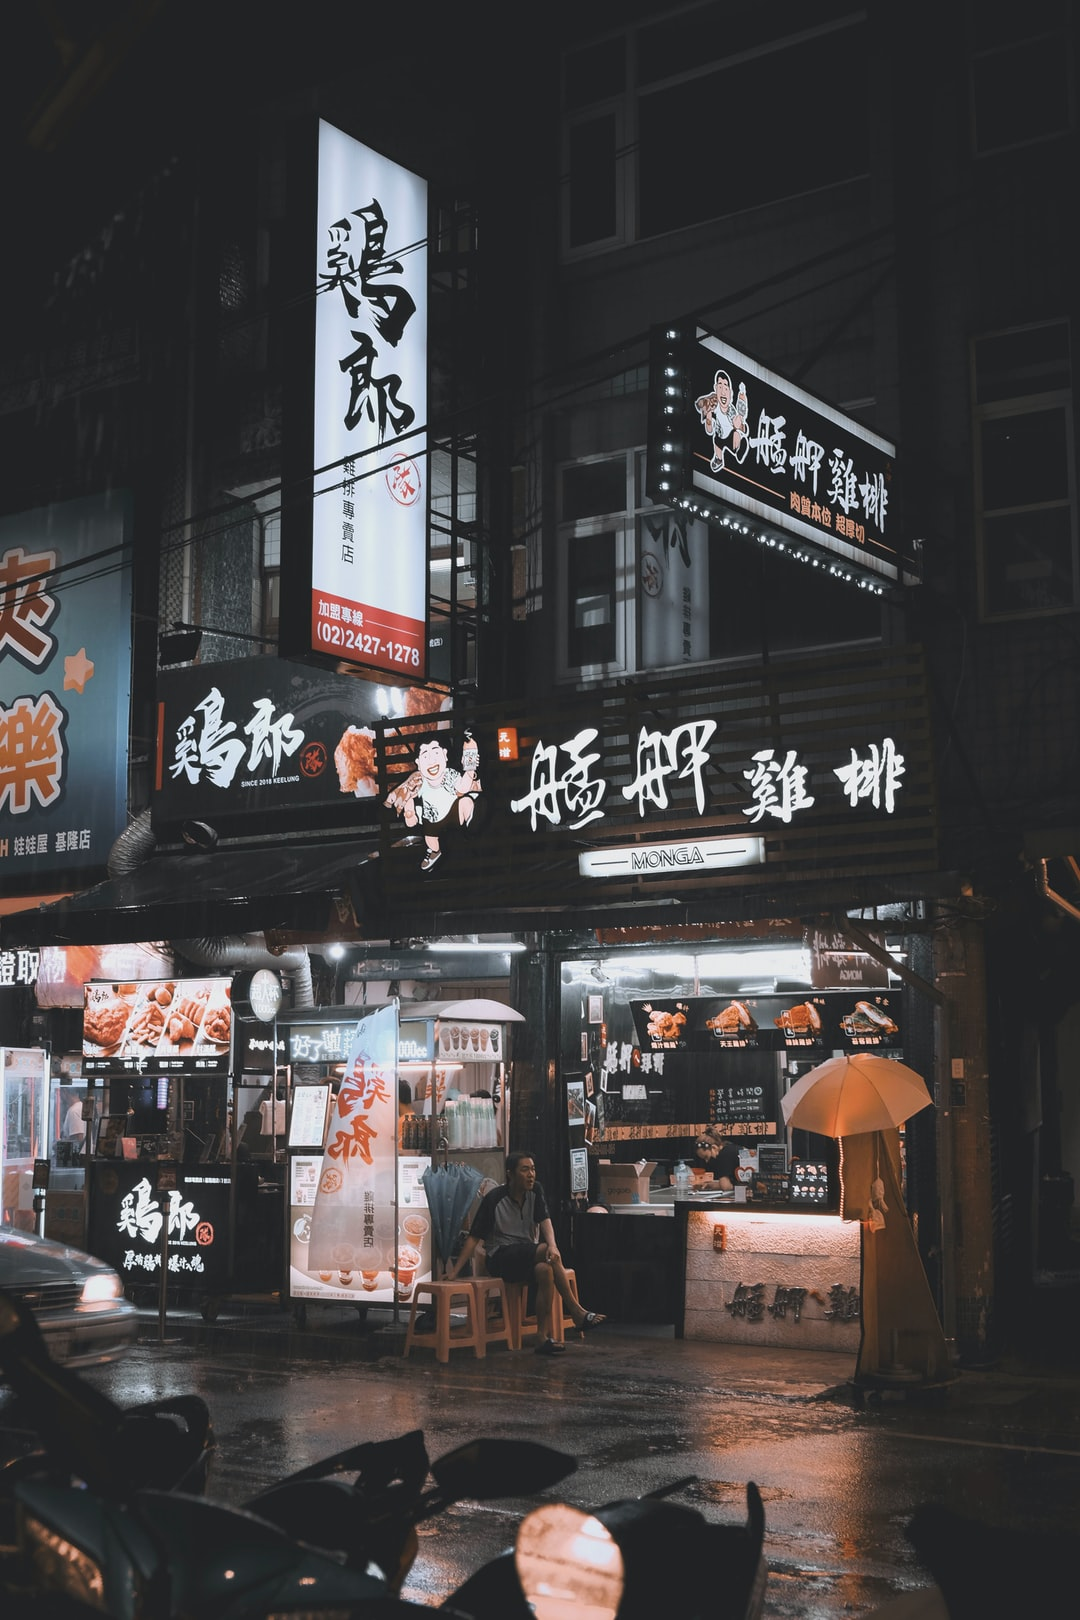 Exploring The Night Market